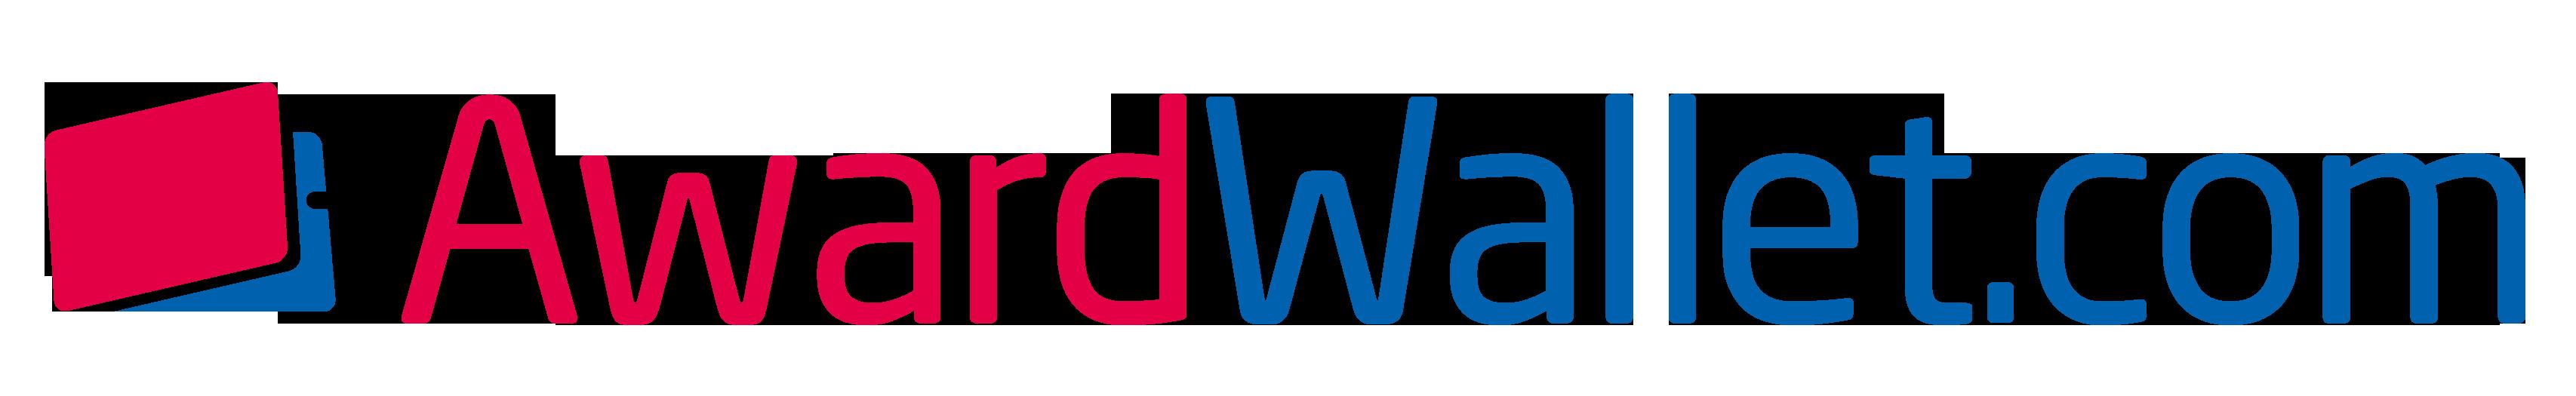 awardwallet